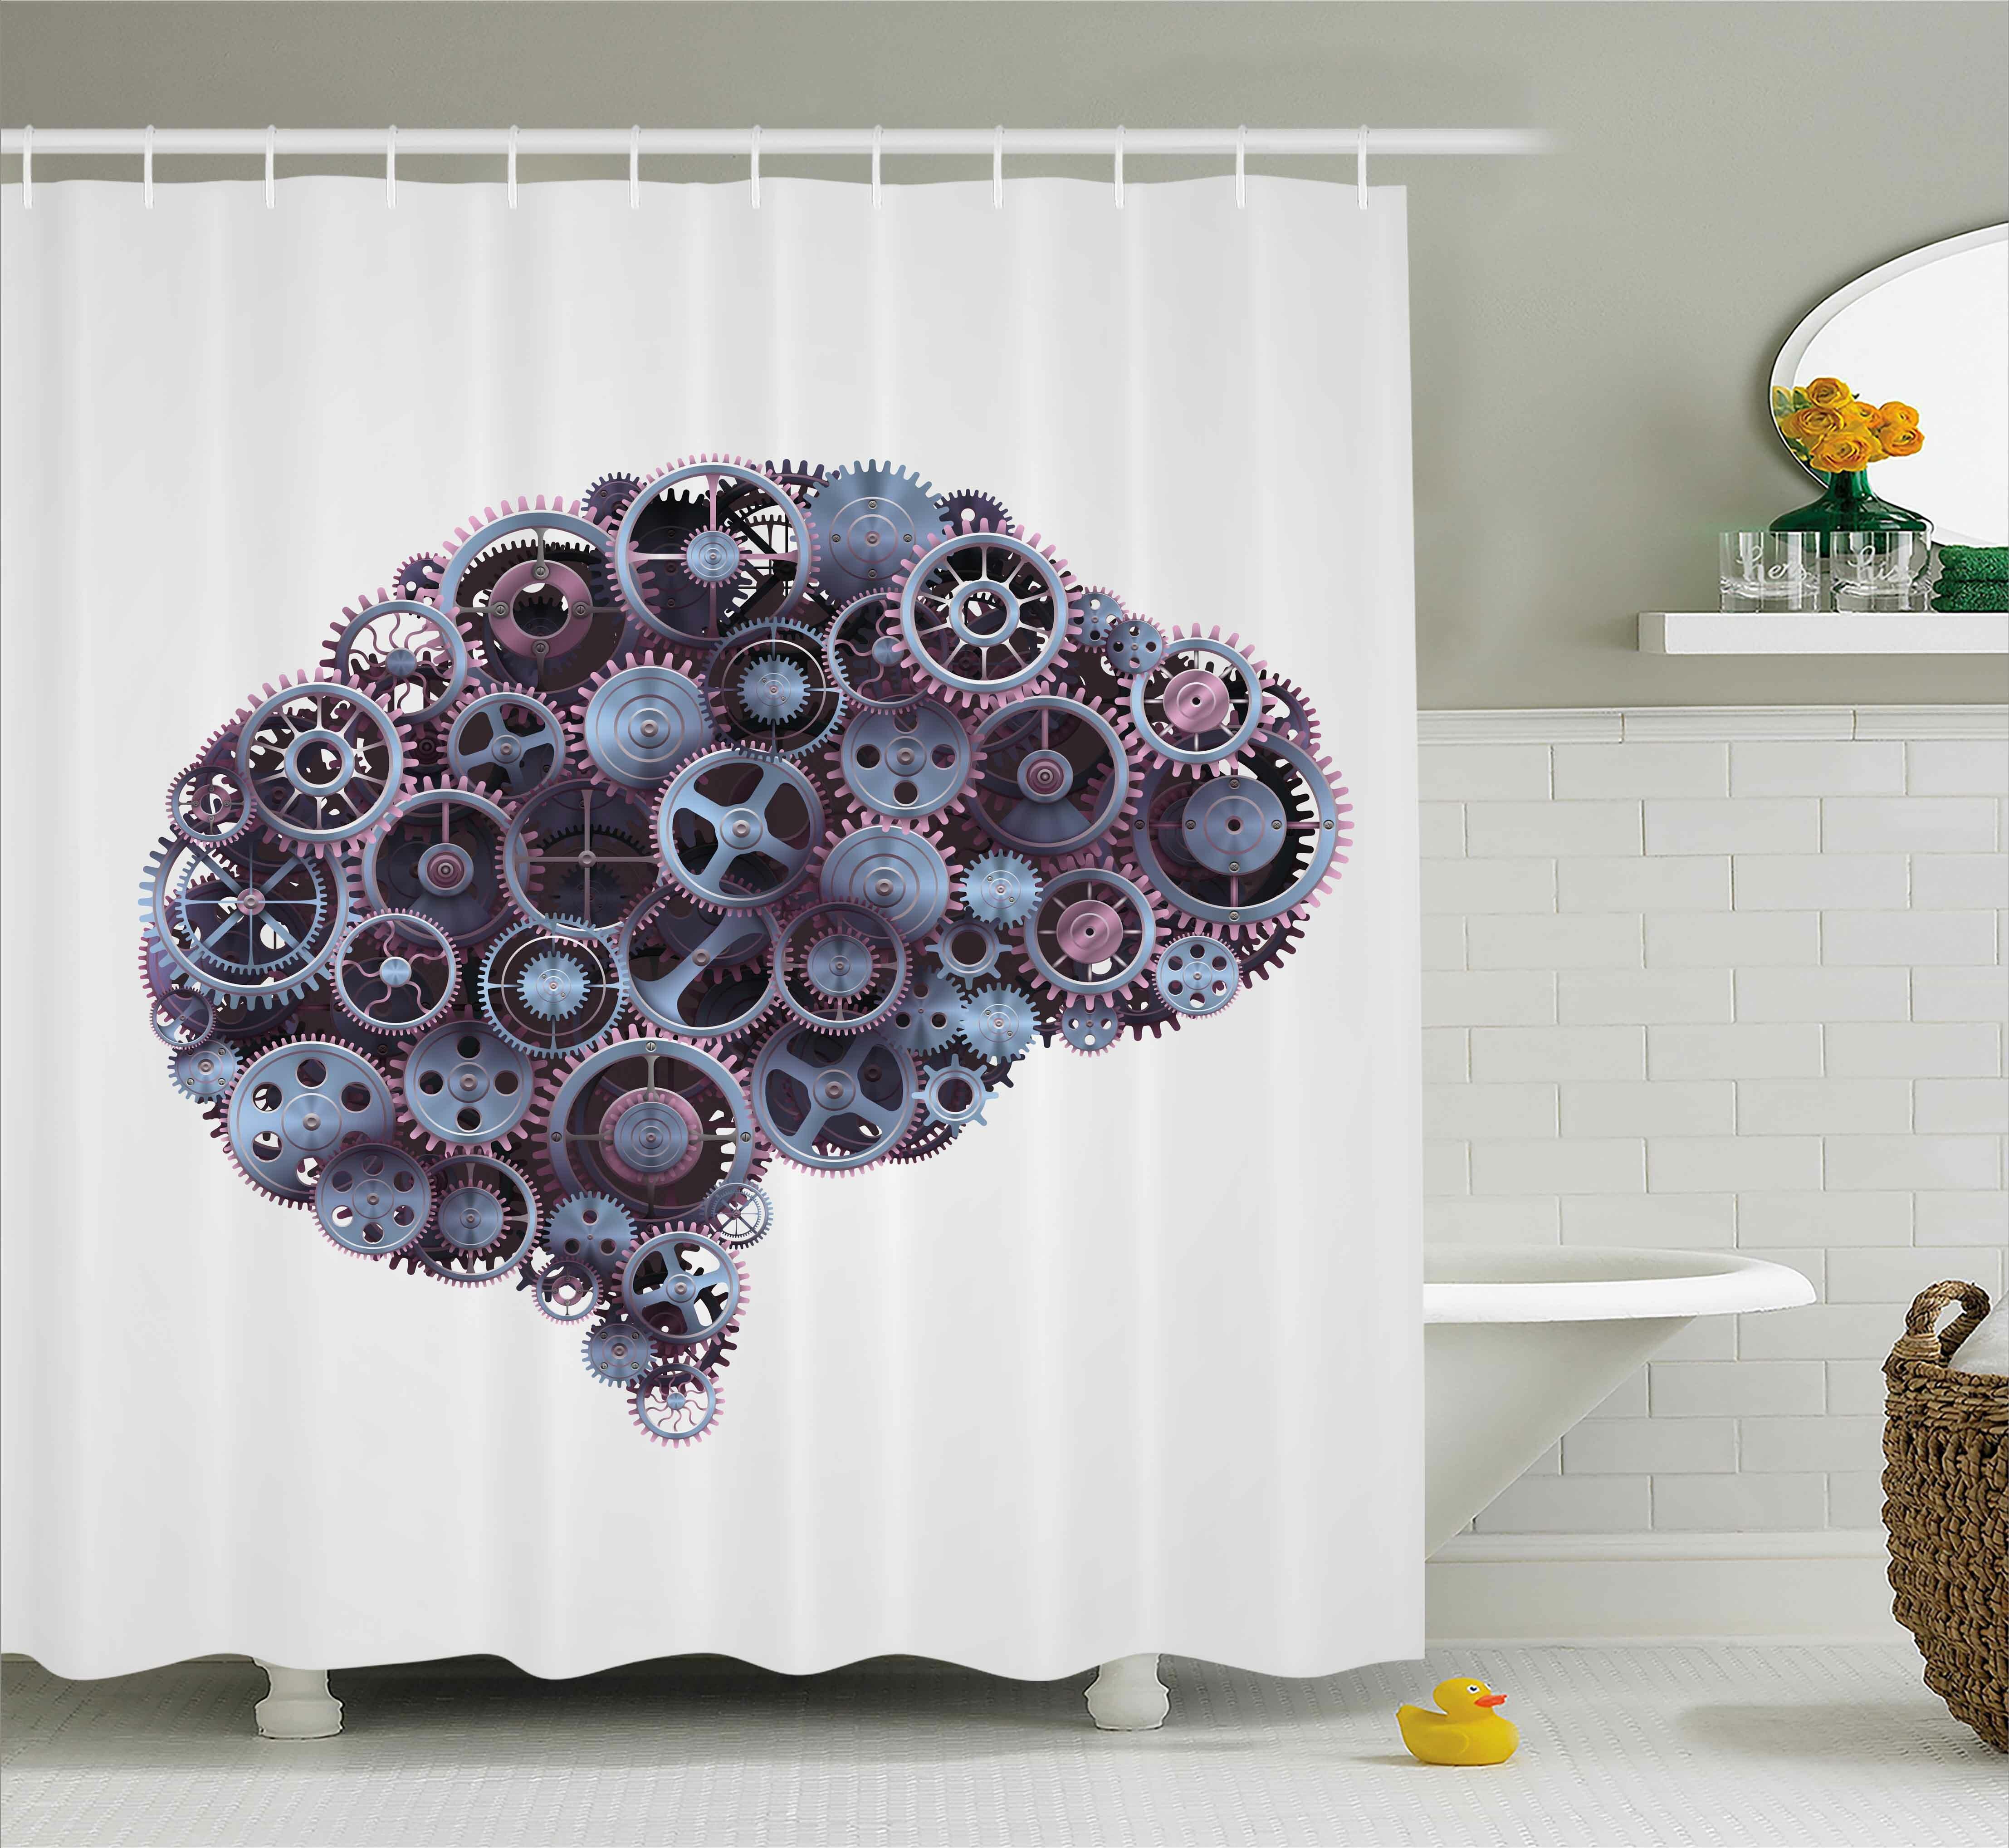 East Urban Home Industrial Decor Shower Curtain